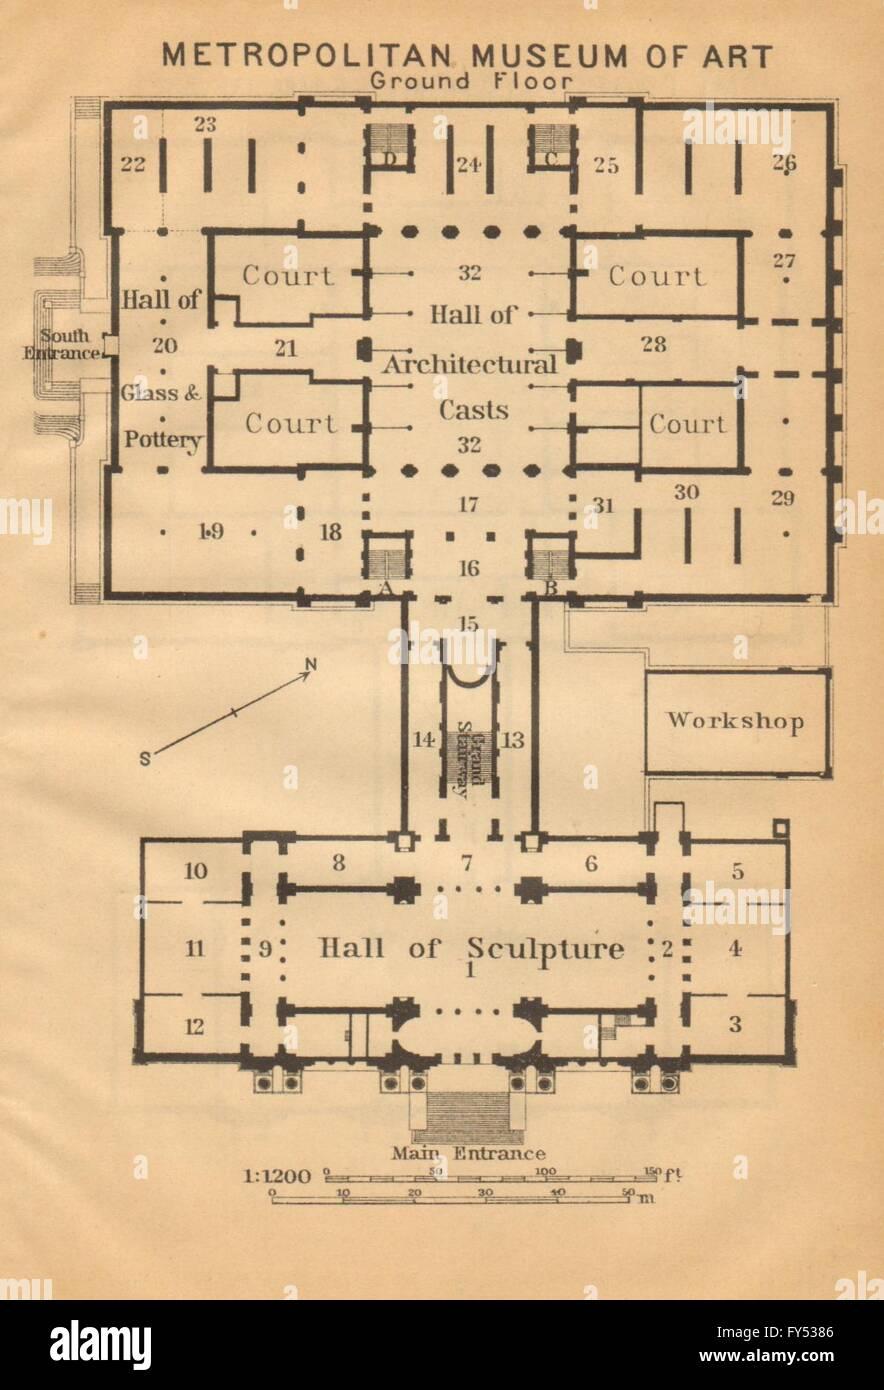 Metropolitan Museum Of Art Ground Floor New York Baedeker 1904 Antique Map Stock Photo Alamy